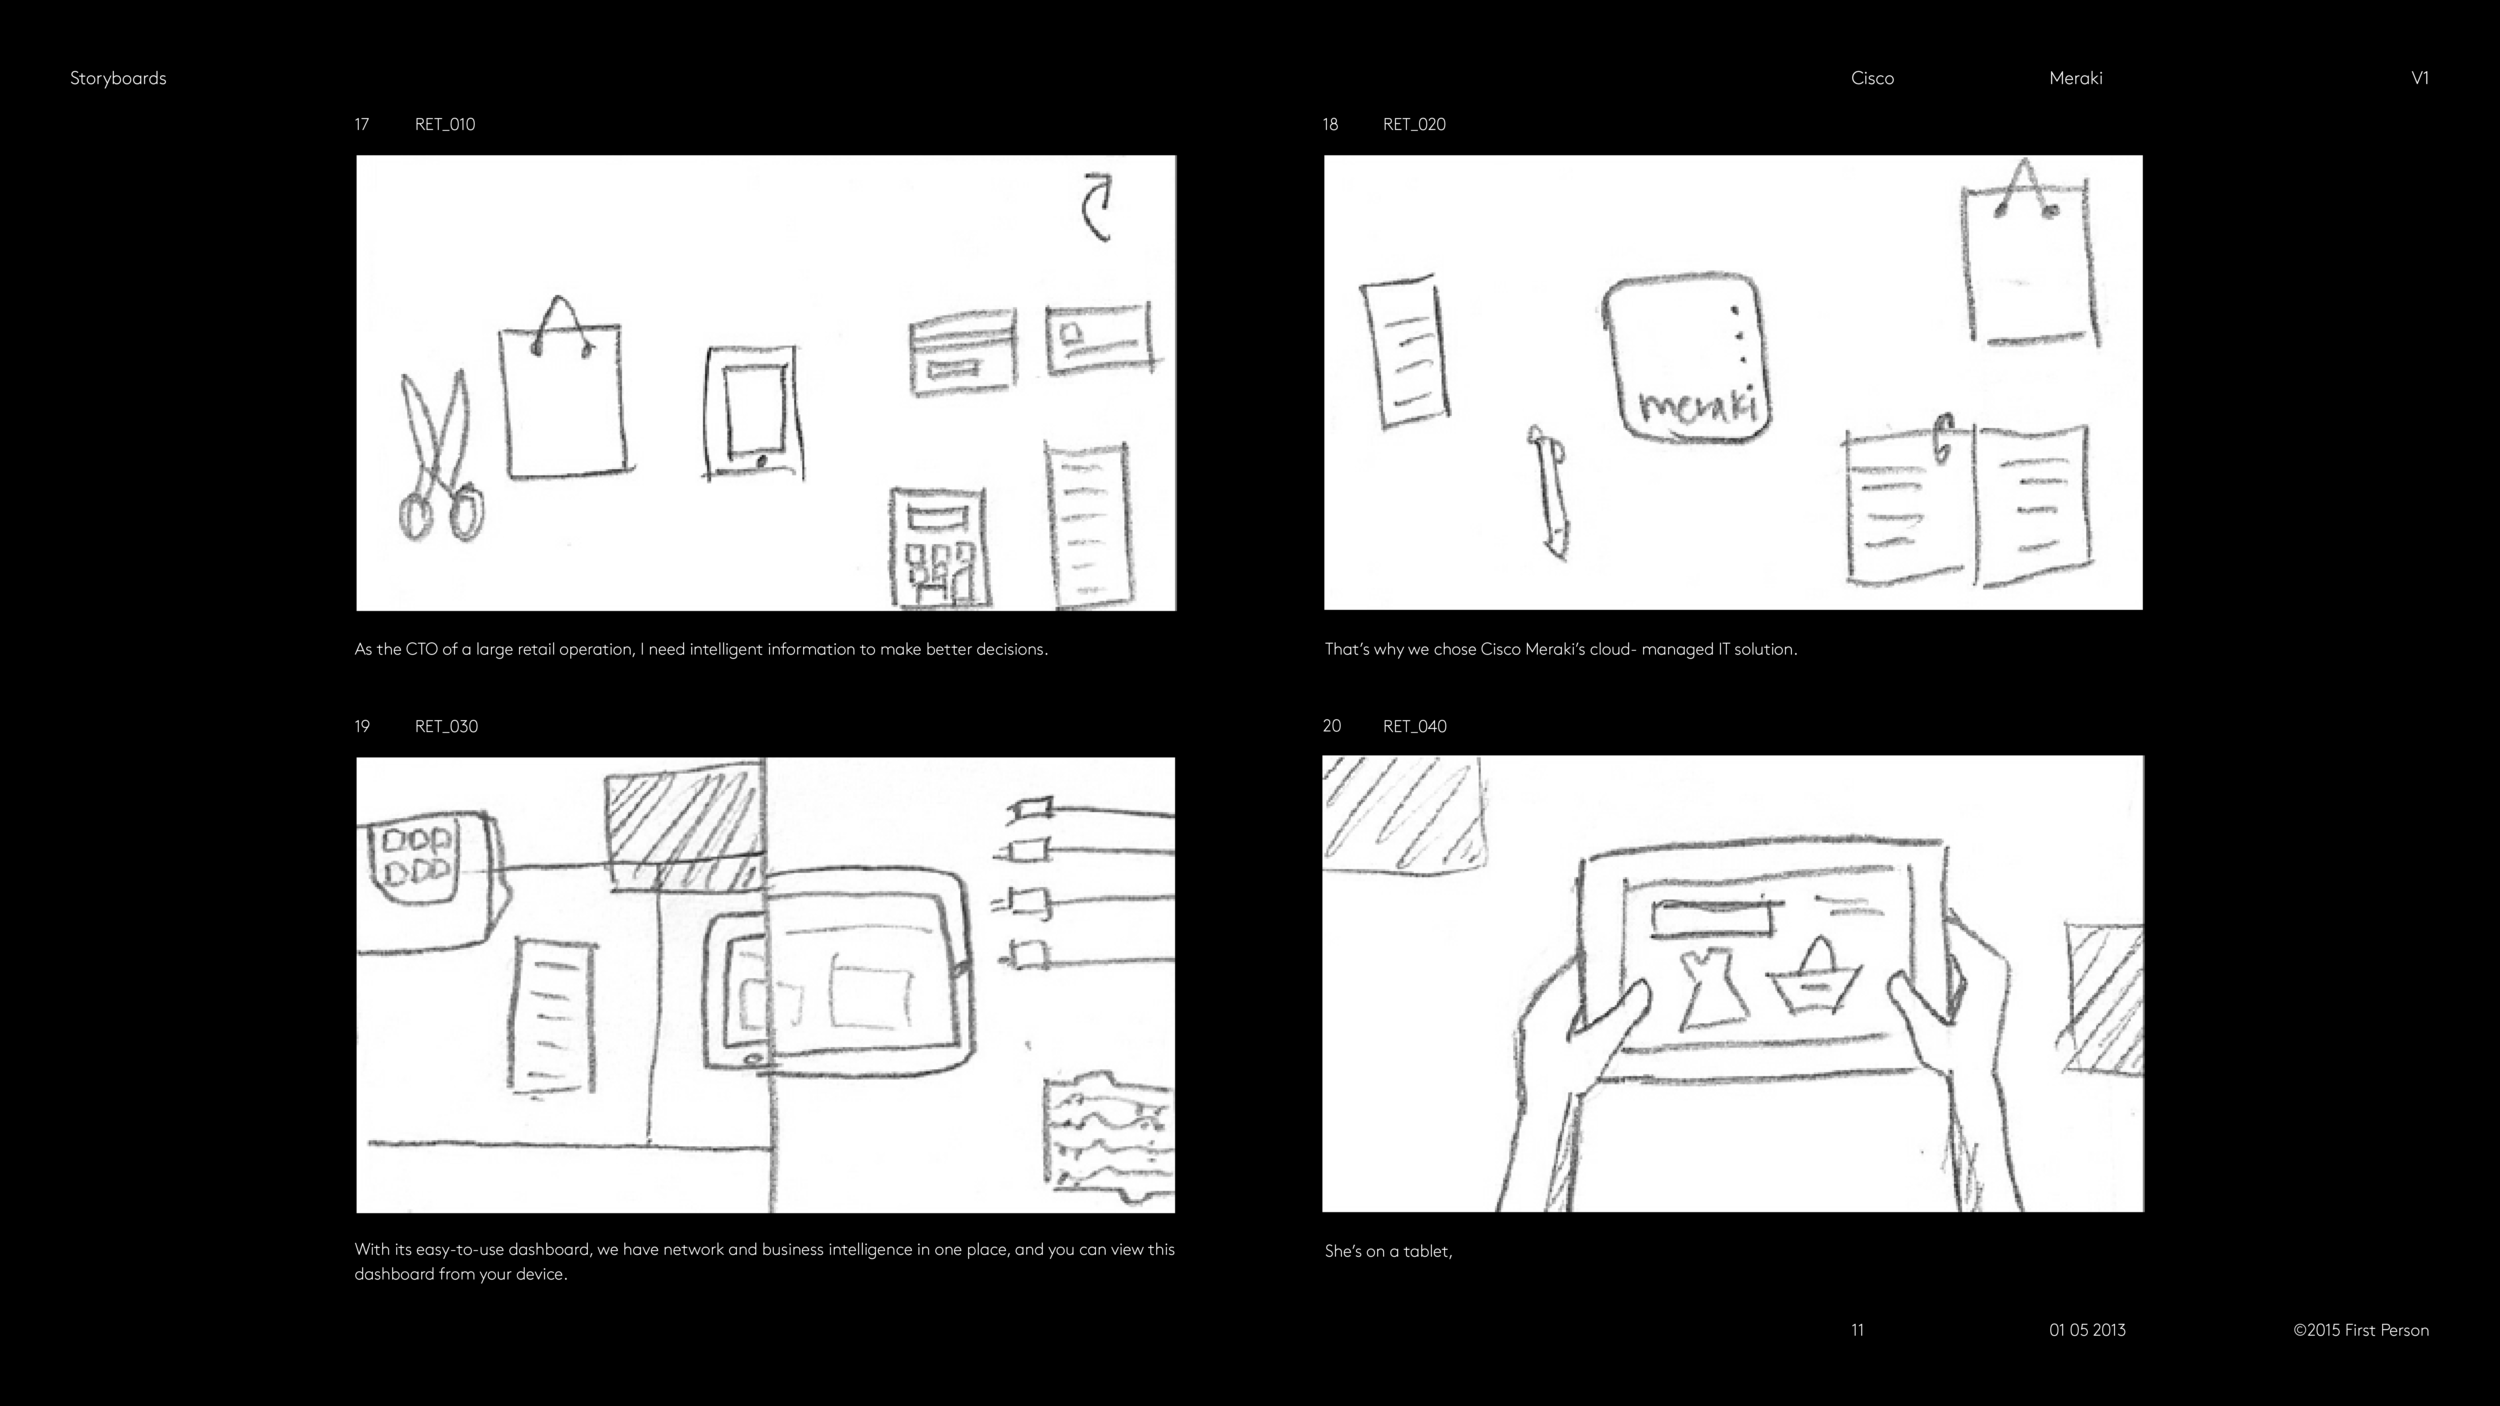 3431_CiscoMeraki_Storyboards_v01-11.png